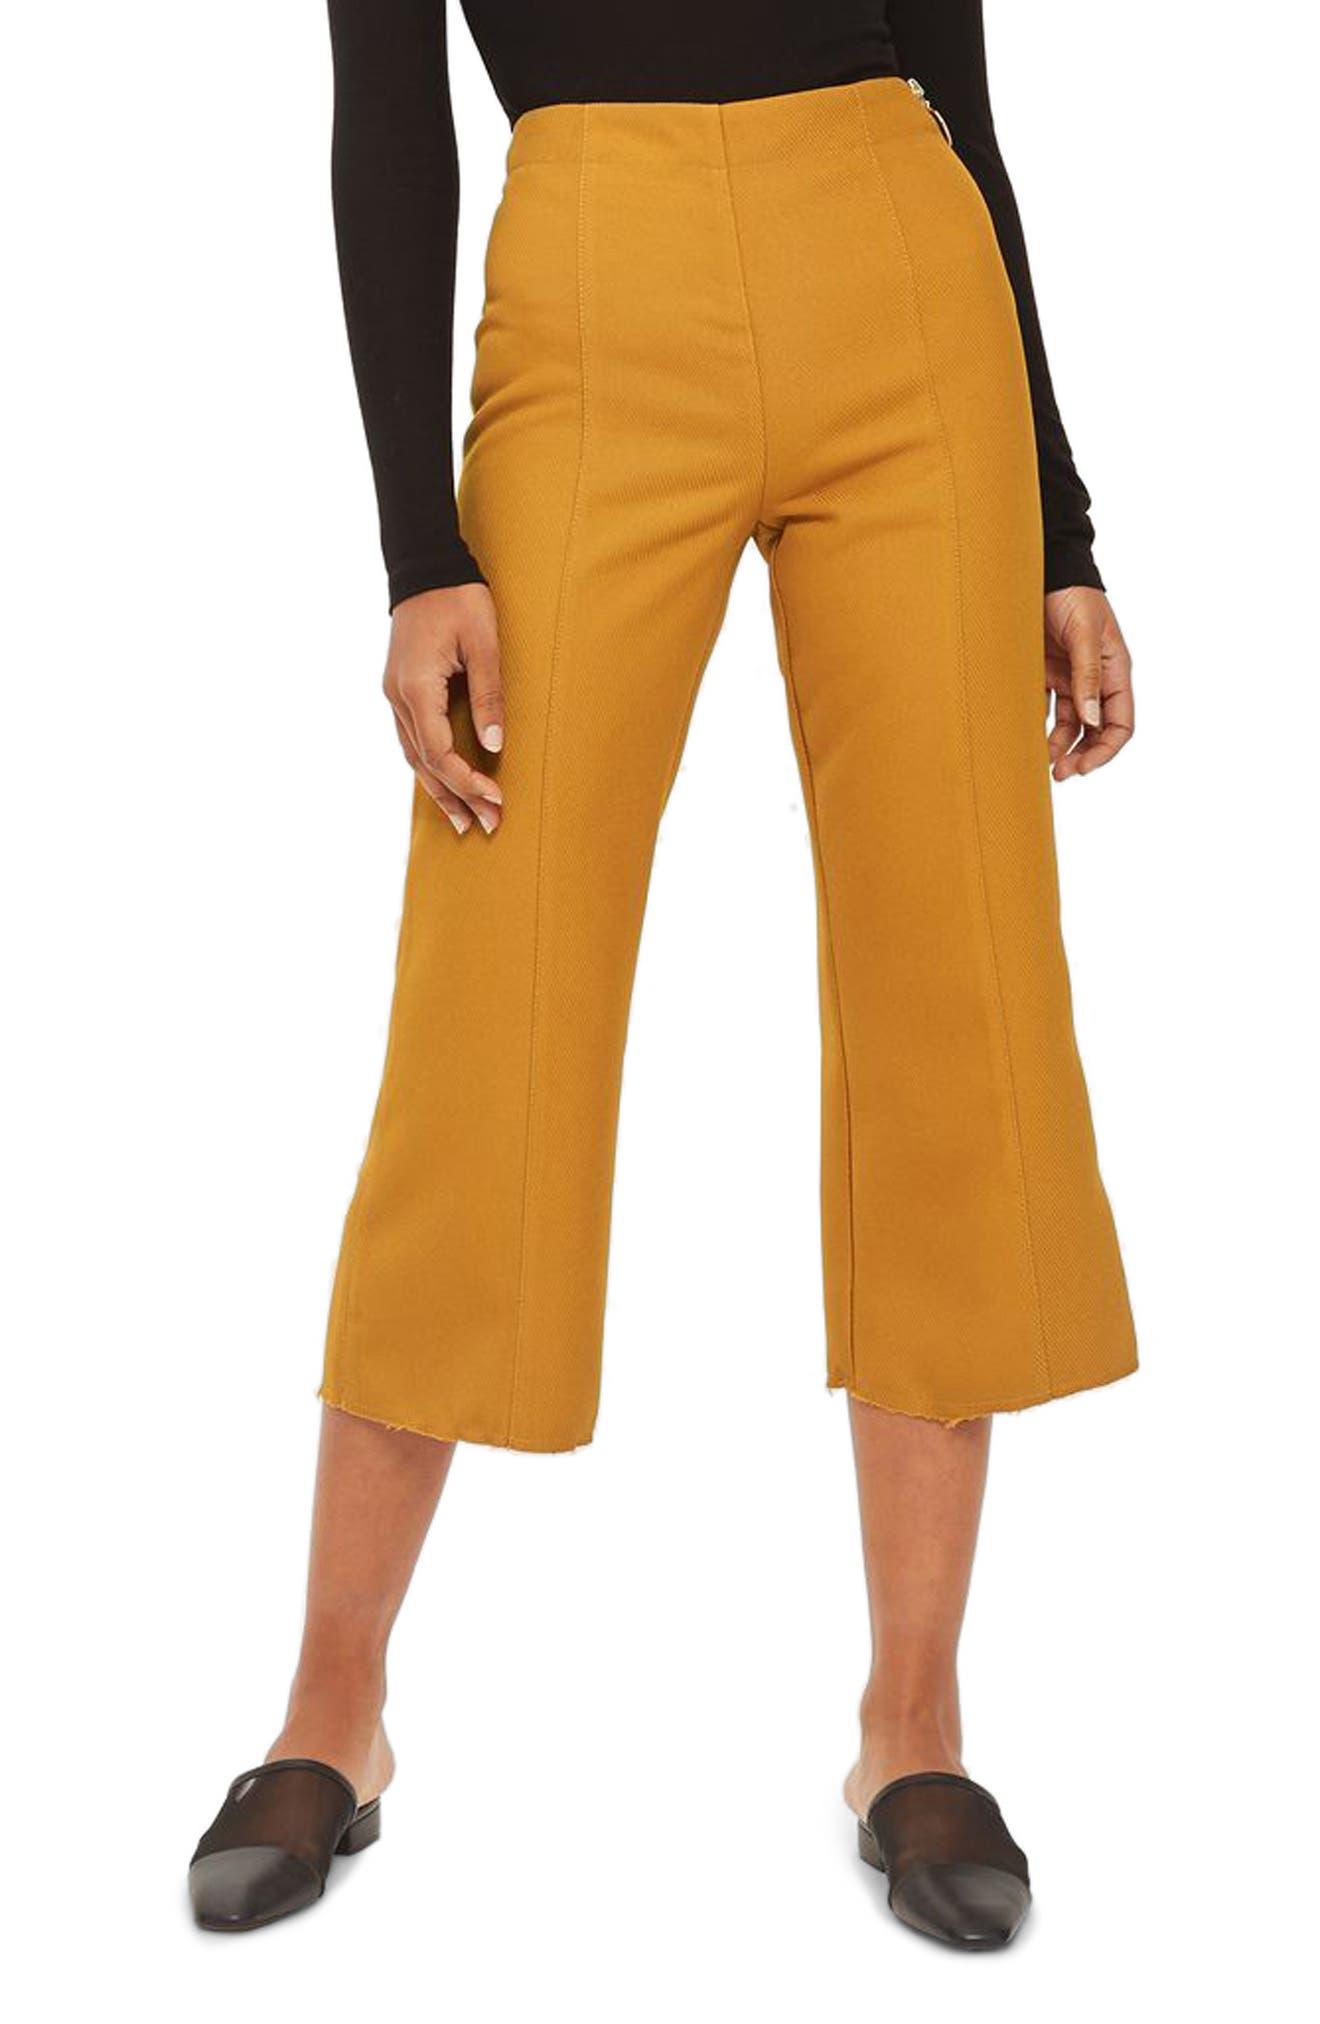 Alternate Image 1 Selected - Topshop Bonded Kick Flare Trousers